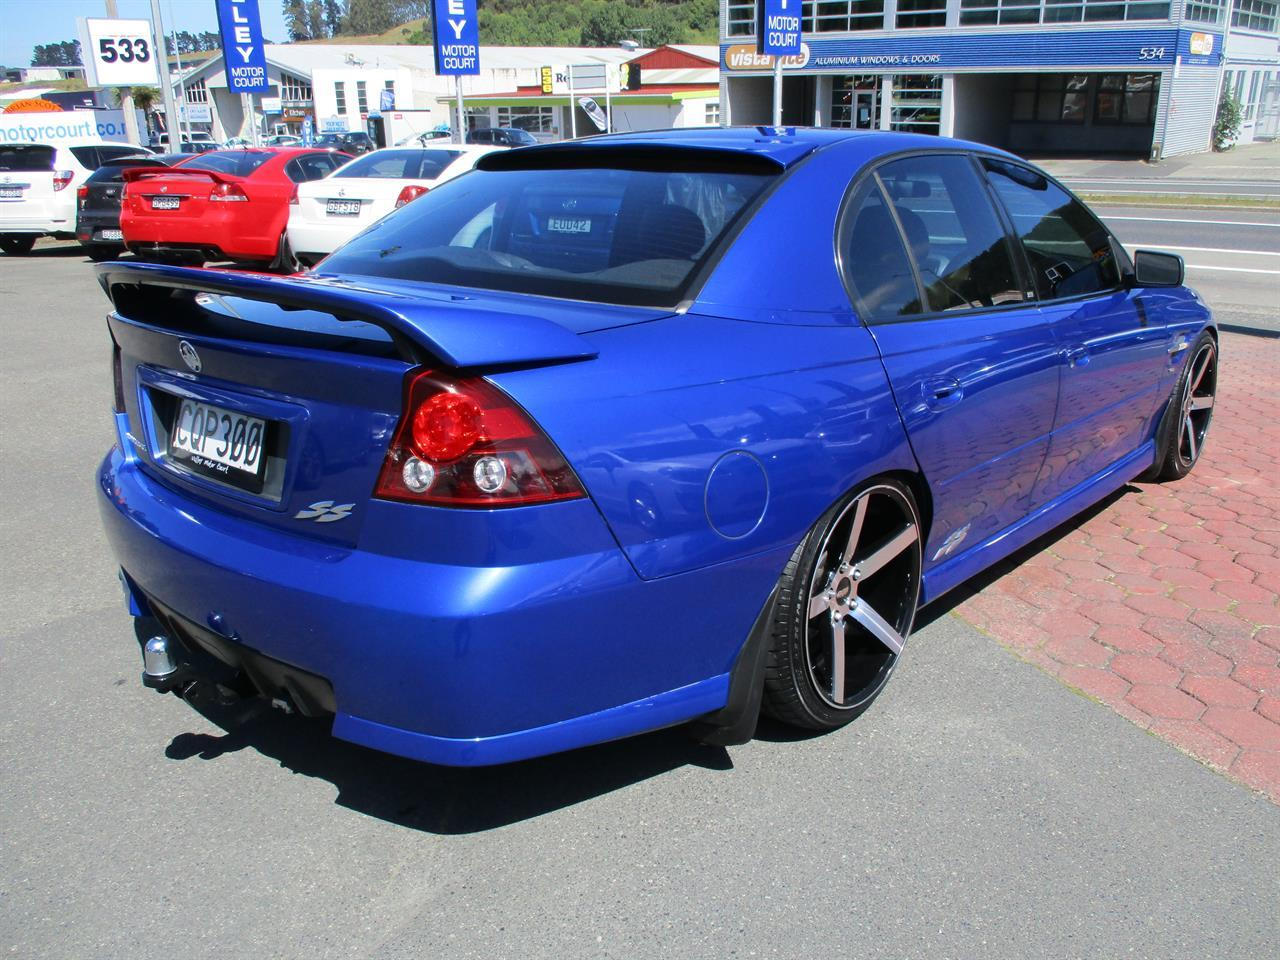 image-4, 2005 Holden Commodore VZ SS at Dunedin